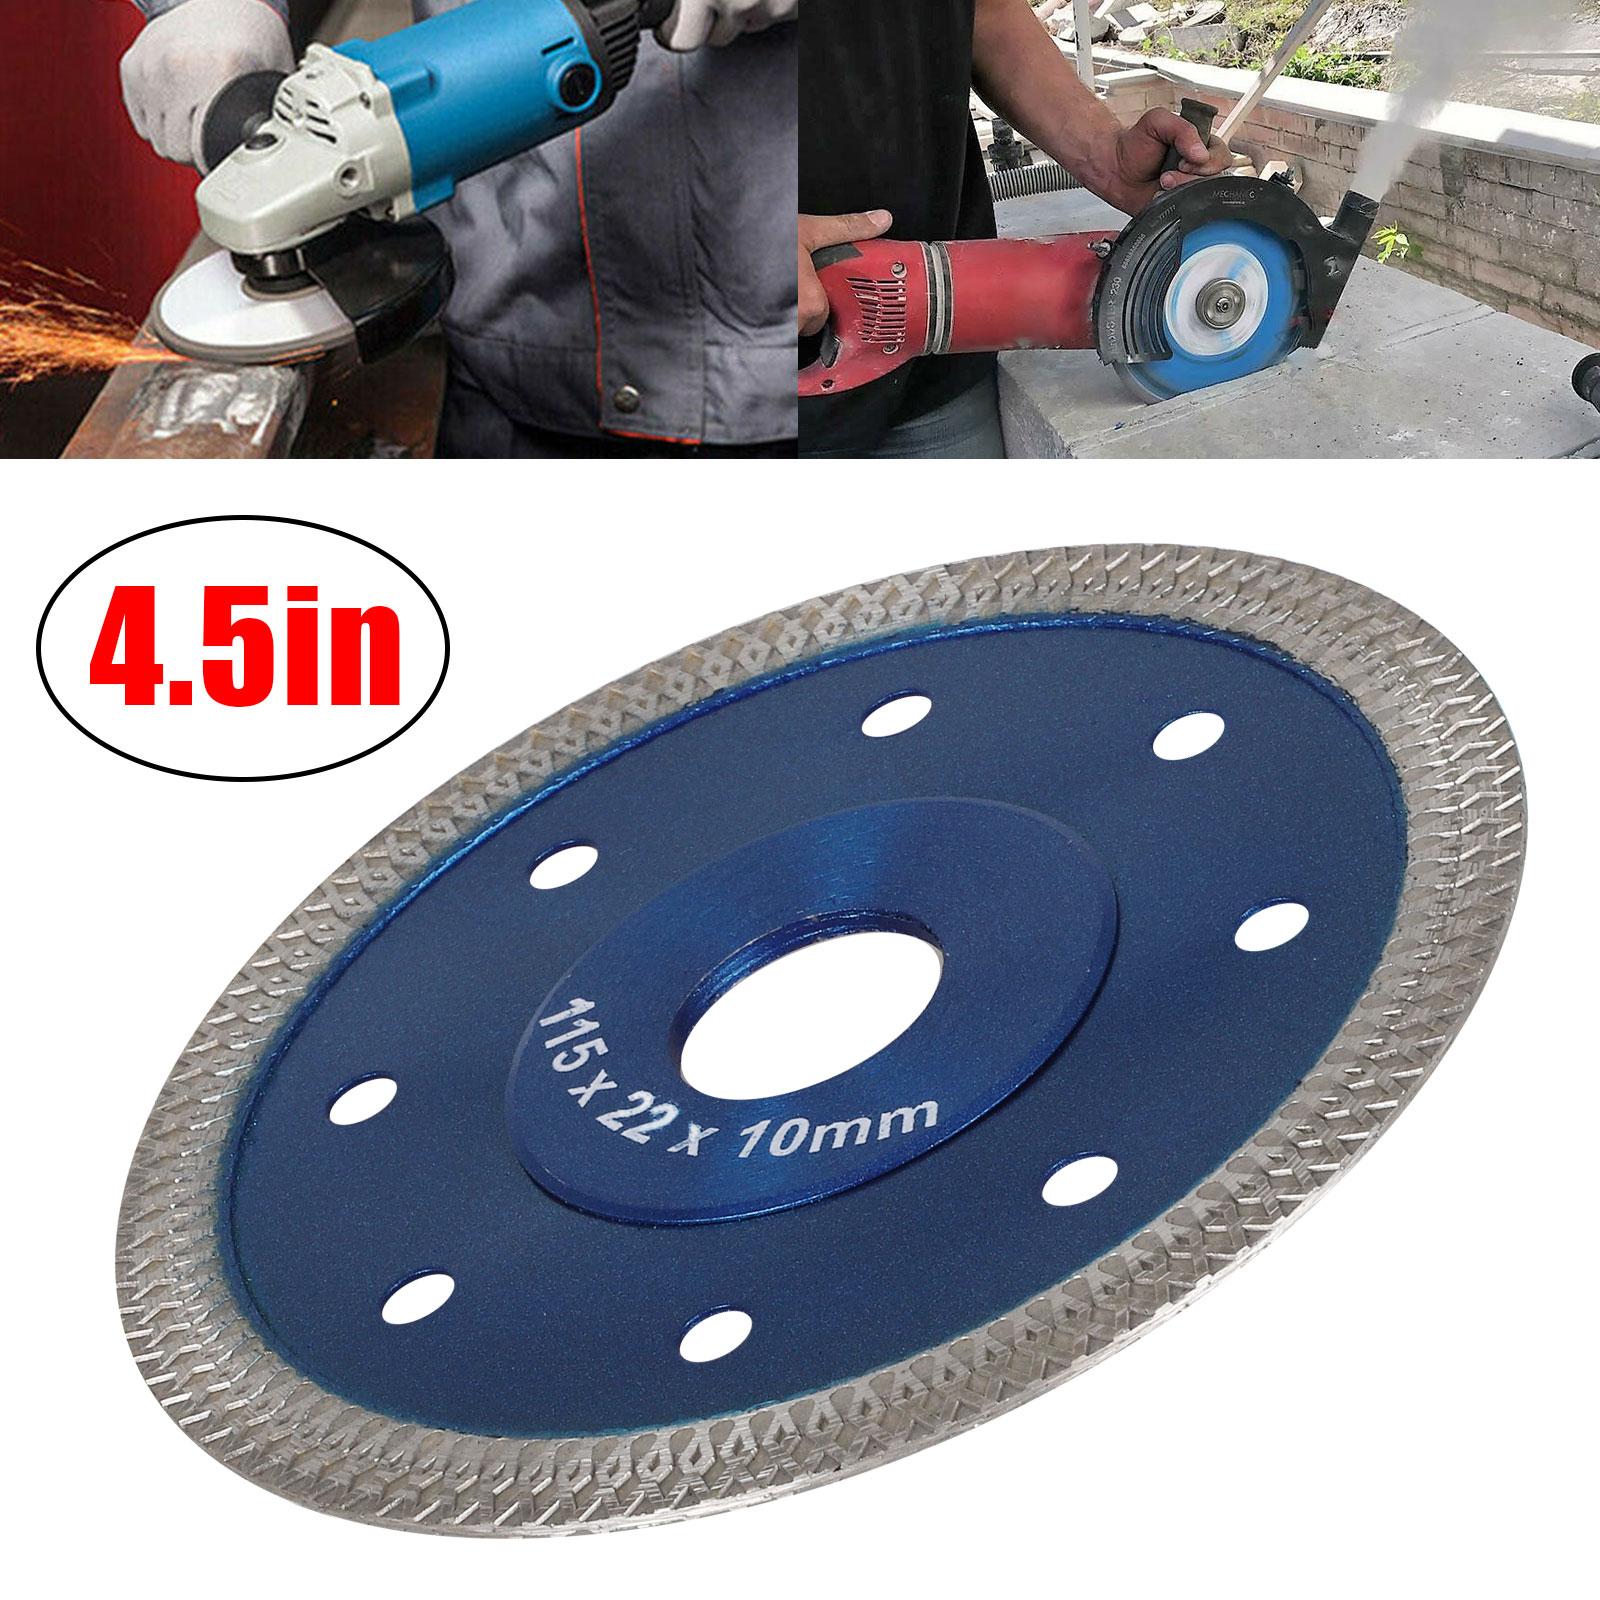 Cuts Porcelain Tile Turbo Diamond Dry Cutting Blade//Disc Grinder Wheel 4 Inch